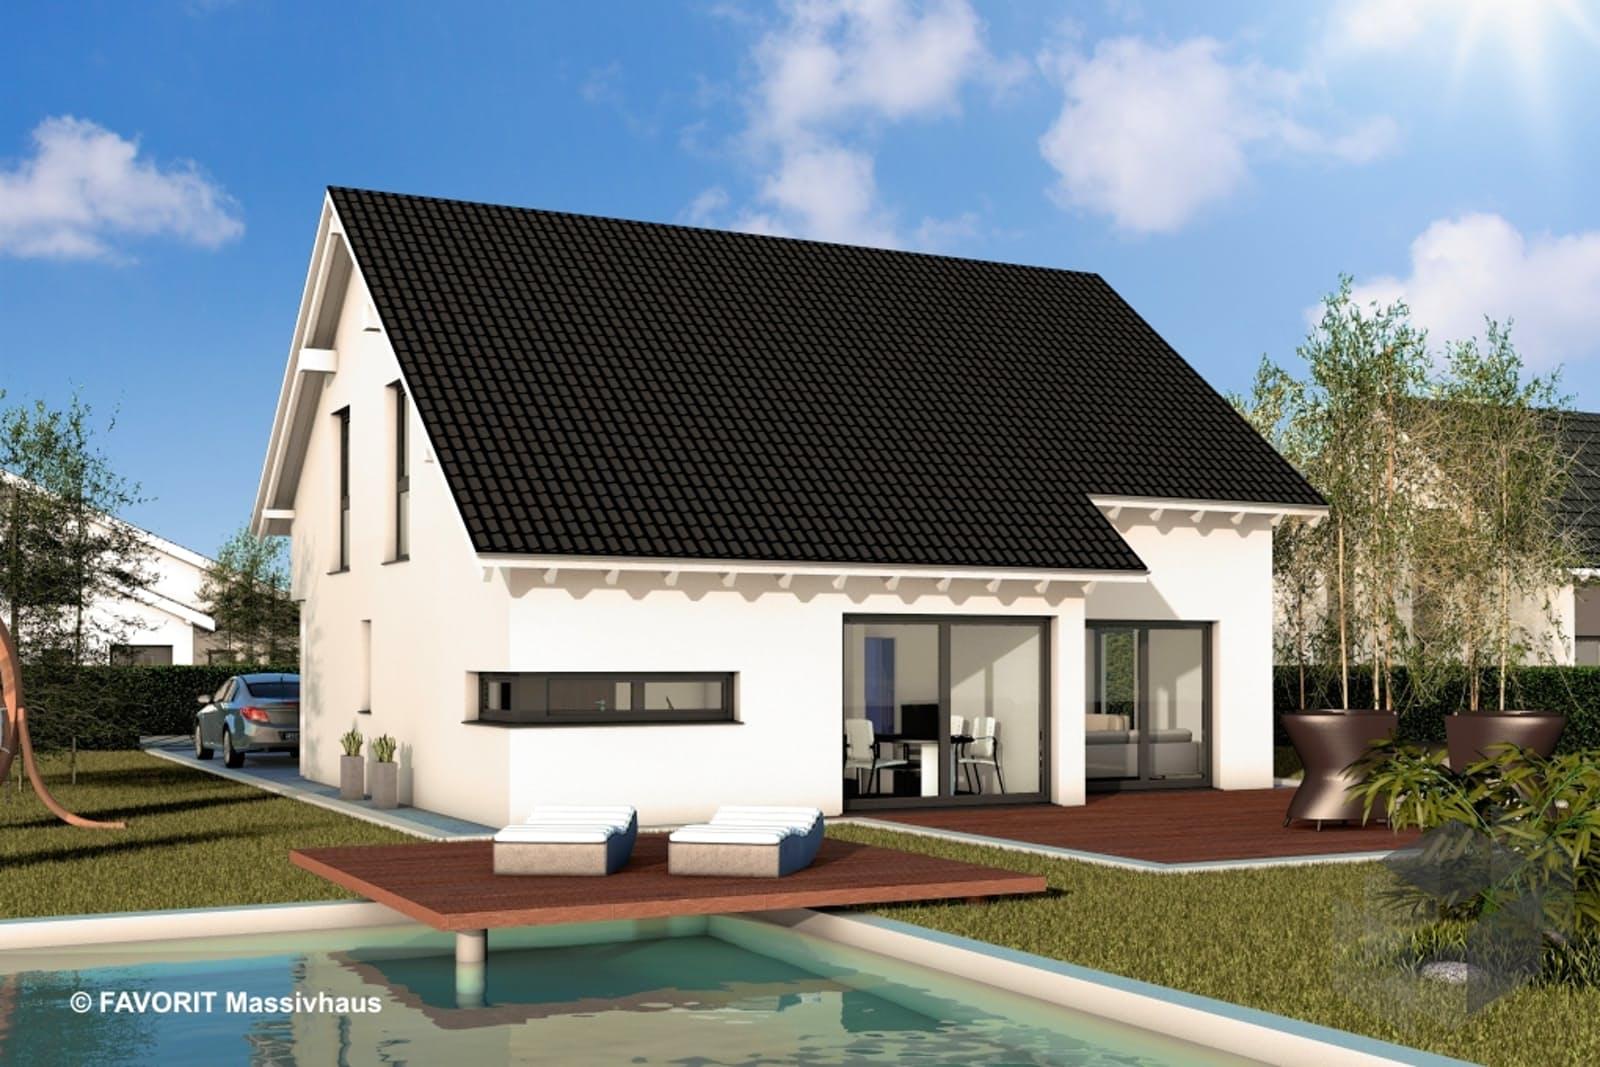 noblesse 155 von favorit massivhaus komplette daten bersicht. Black Bedroom Furniture Sets. Home Design Ideas